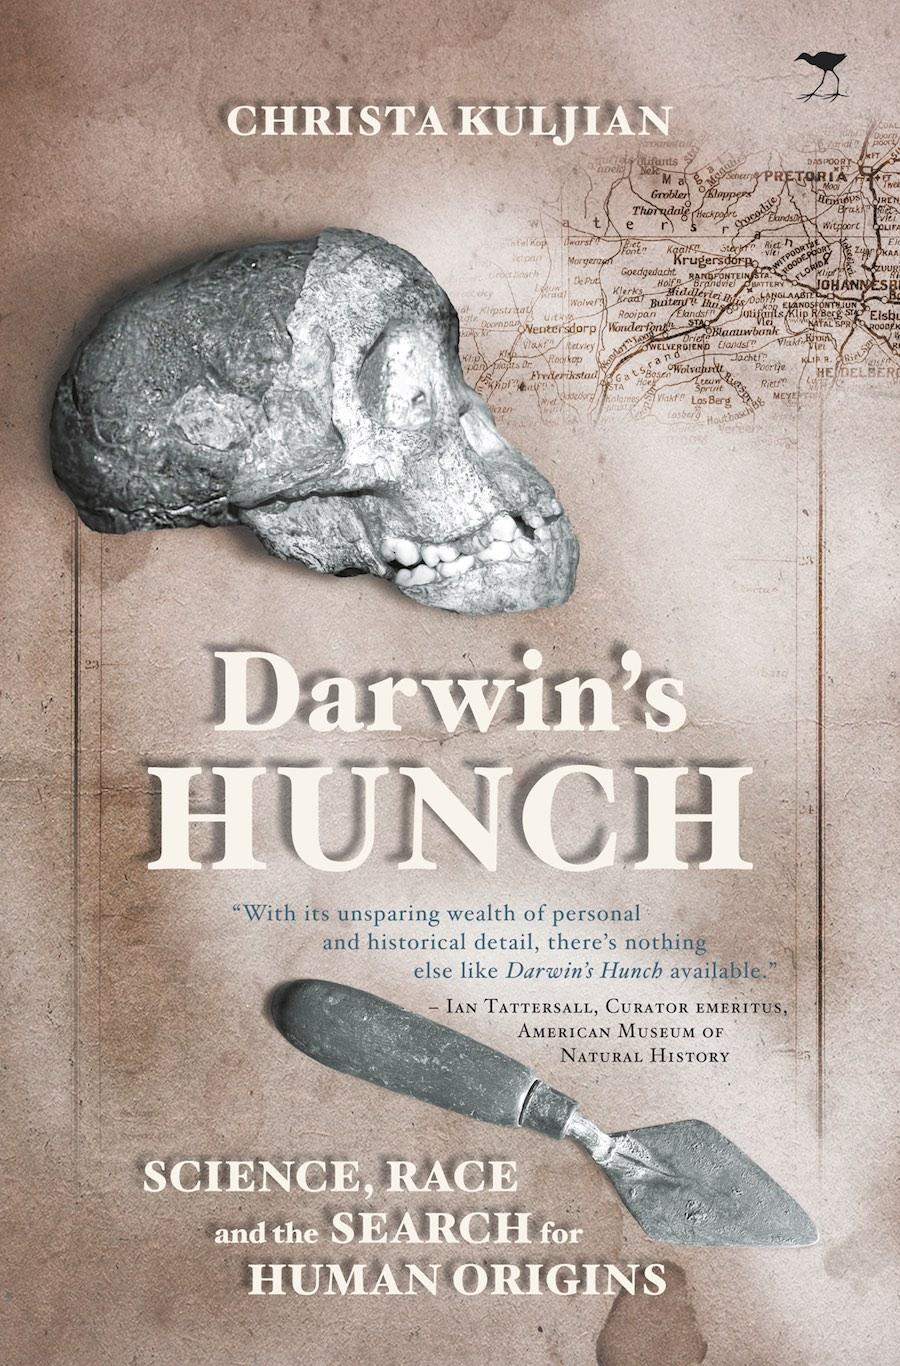 The Book Revue - Darwins hunch